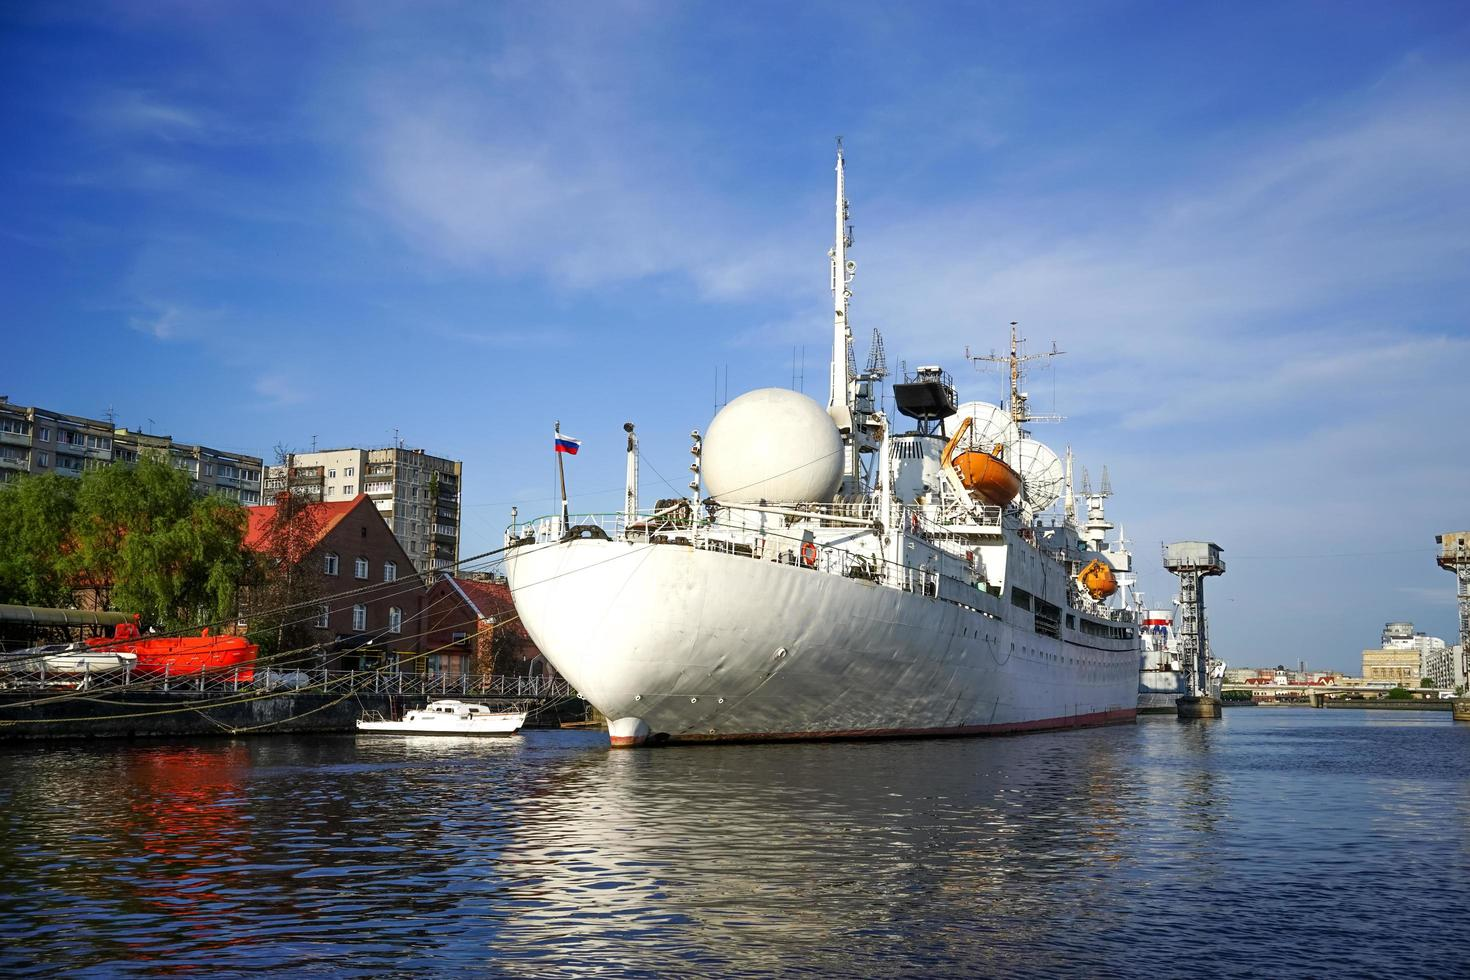 stadslandskap med ett stort vitt skepp vid piren. foto